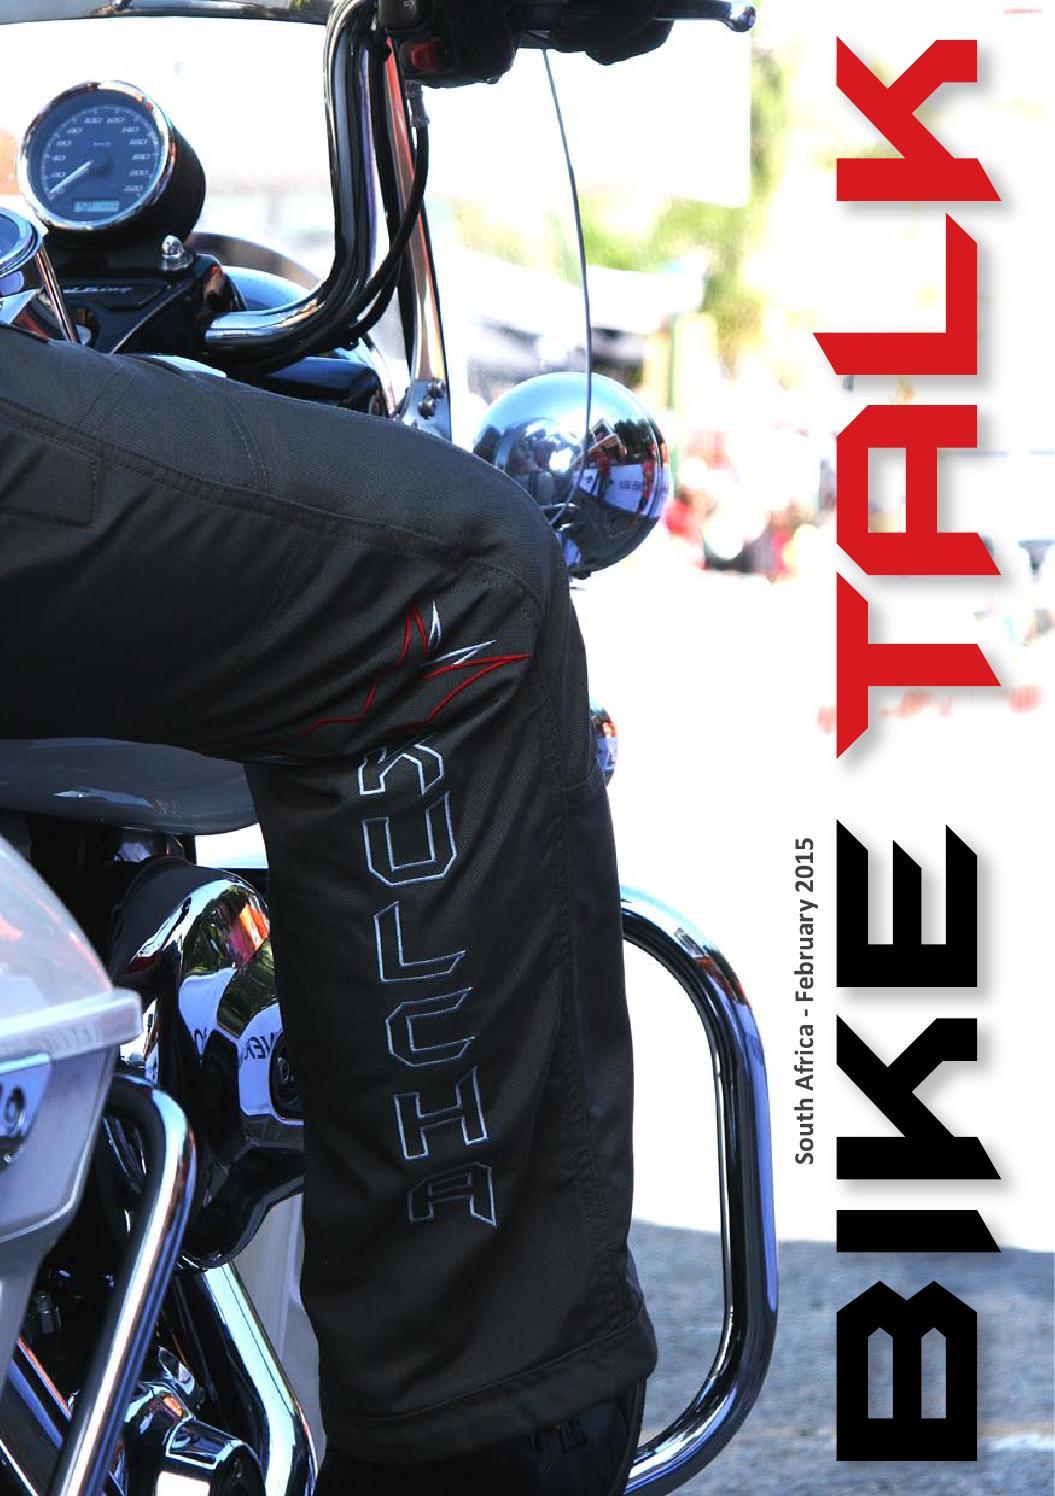 HJC IS 17 BARBWIRE MC31 Motorcycle Helmet with Int Sun Visor and Big